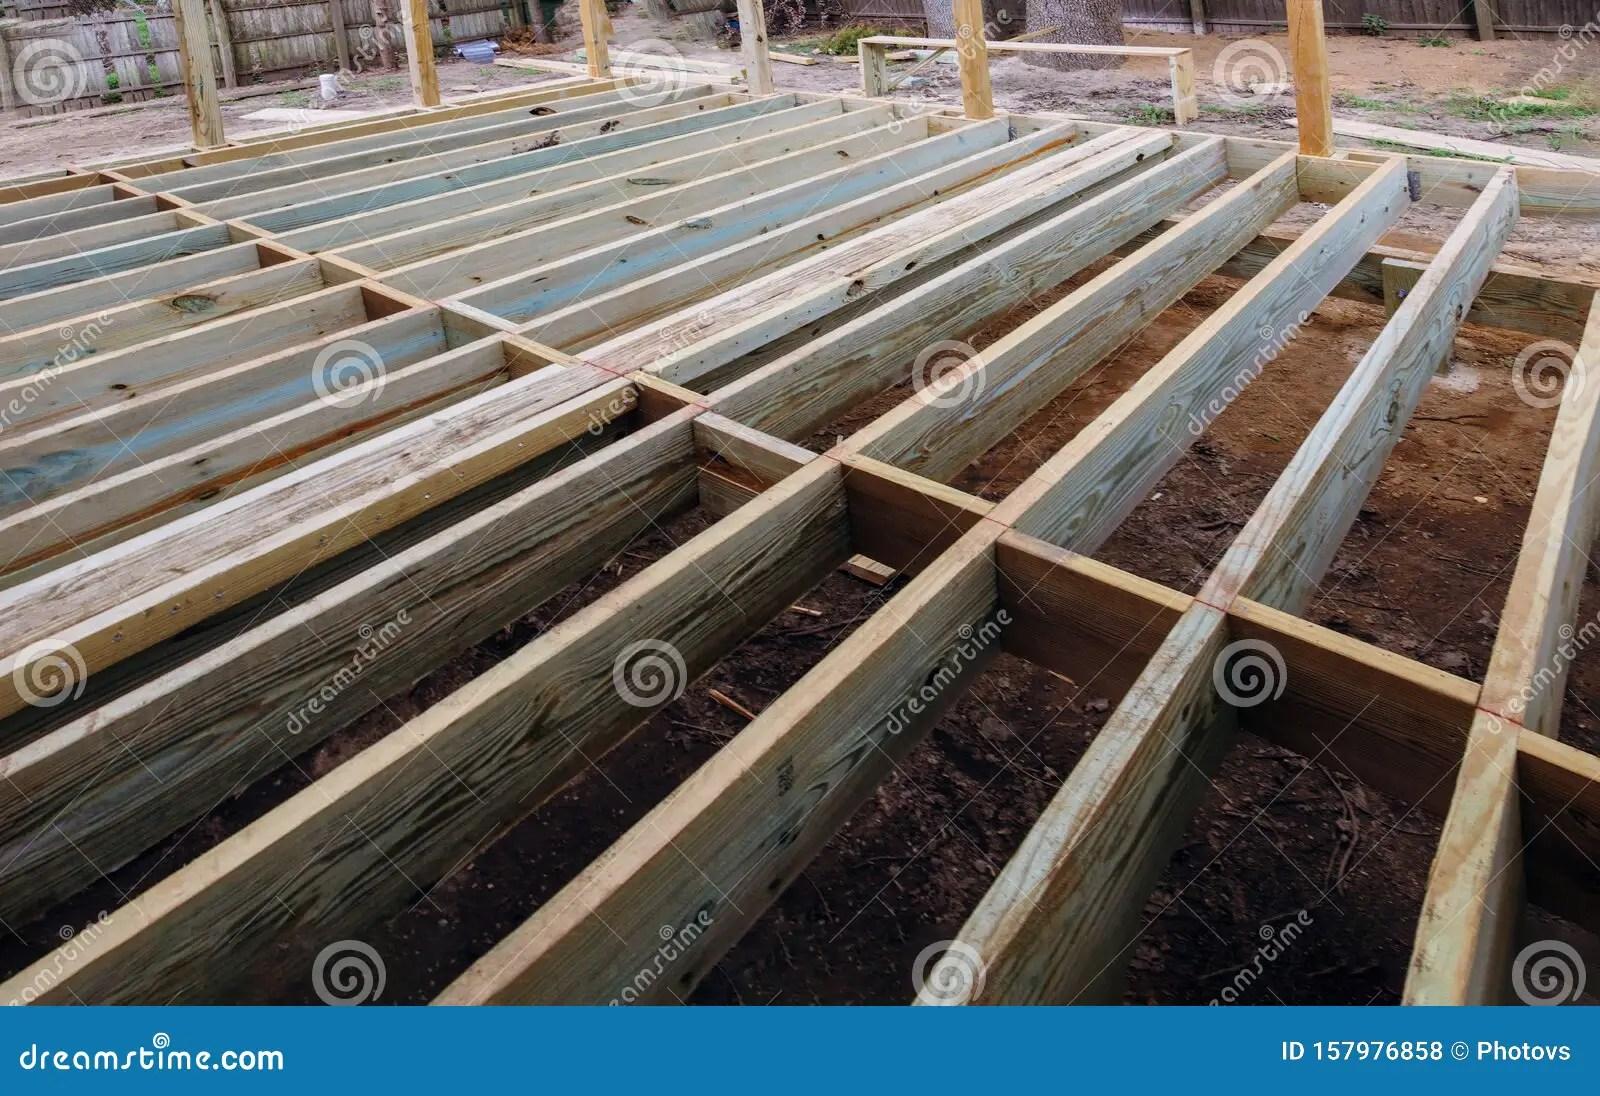 https www dreamstime com installing wood floor patio deck new wooden decking fragment planks porch floorboard installation woodwork terrace image157976858